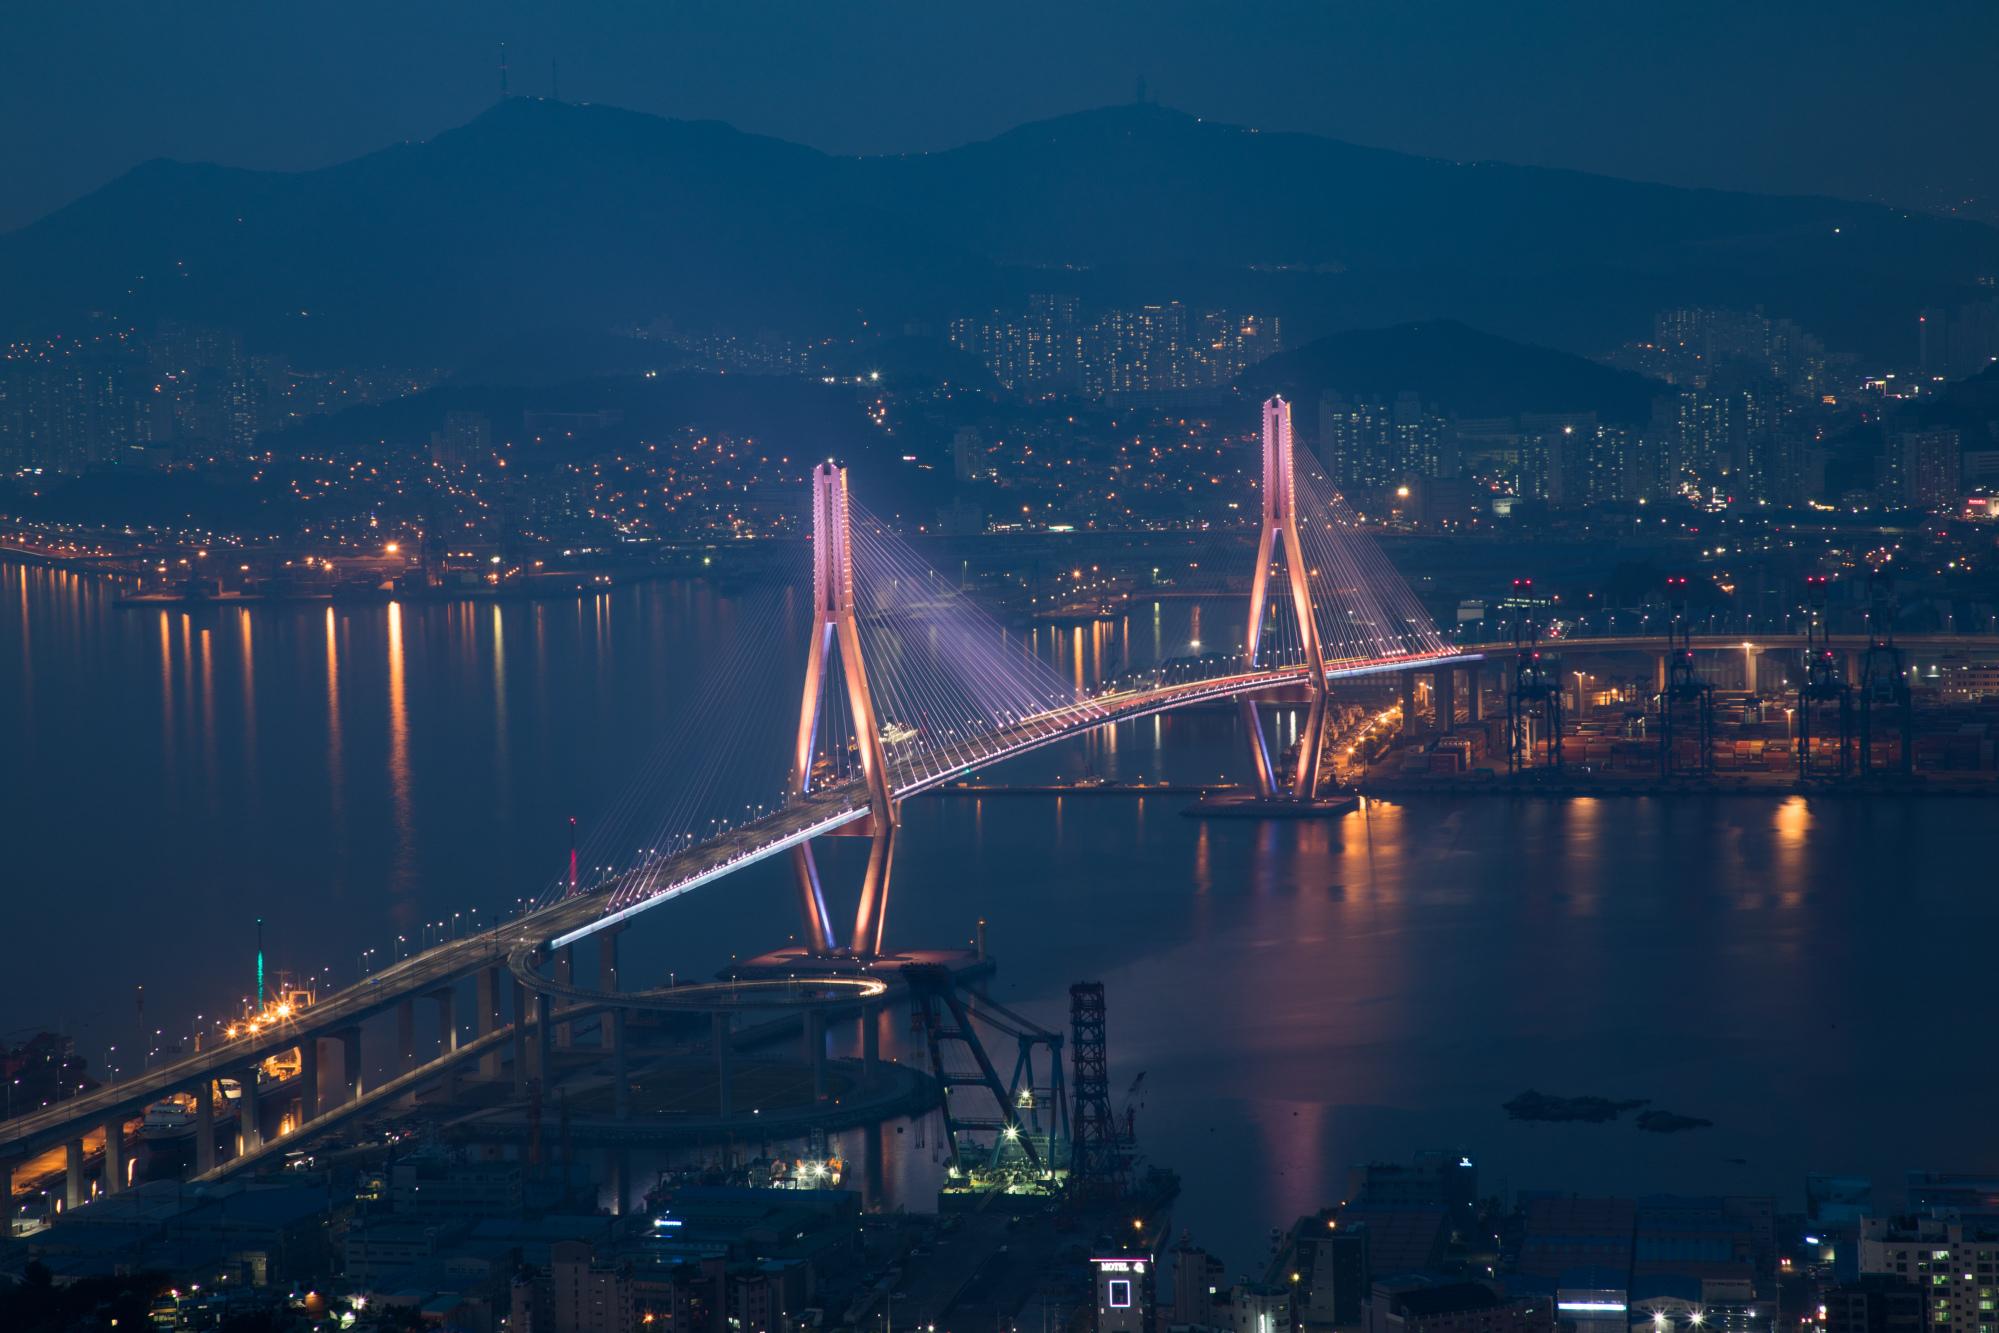 bloomberg.com - David Finnerty - Korea GDP in Focus for Global Investors Piling Into Bond Market